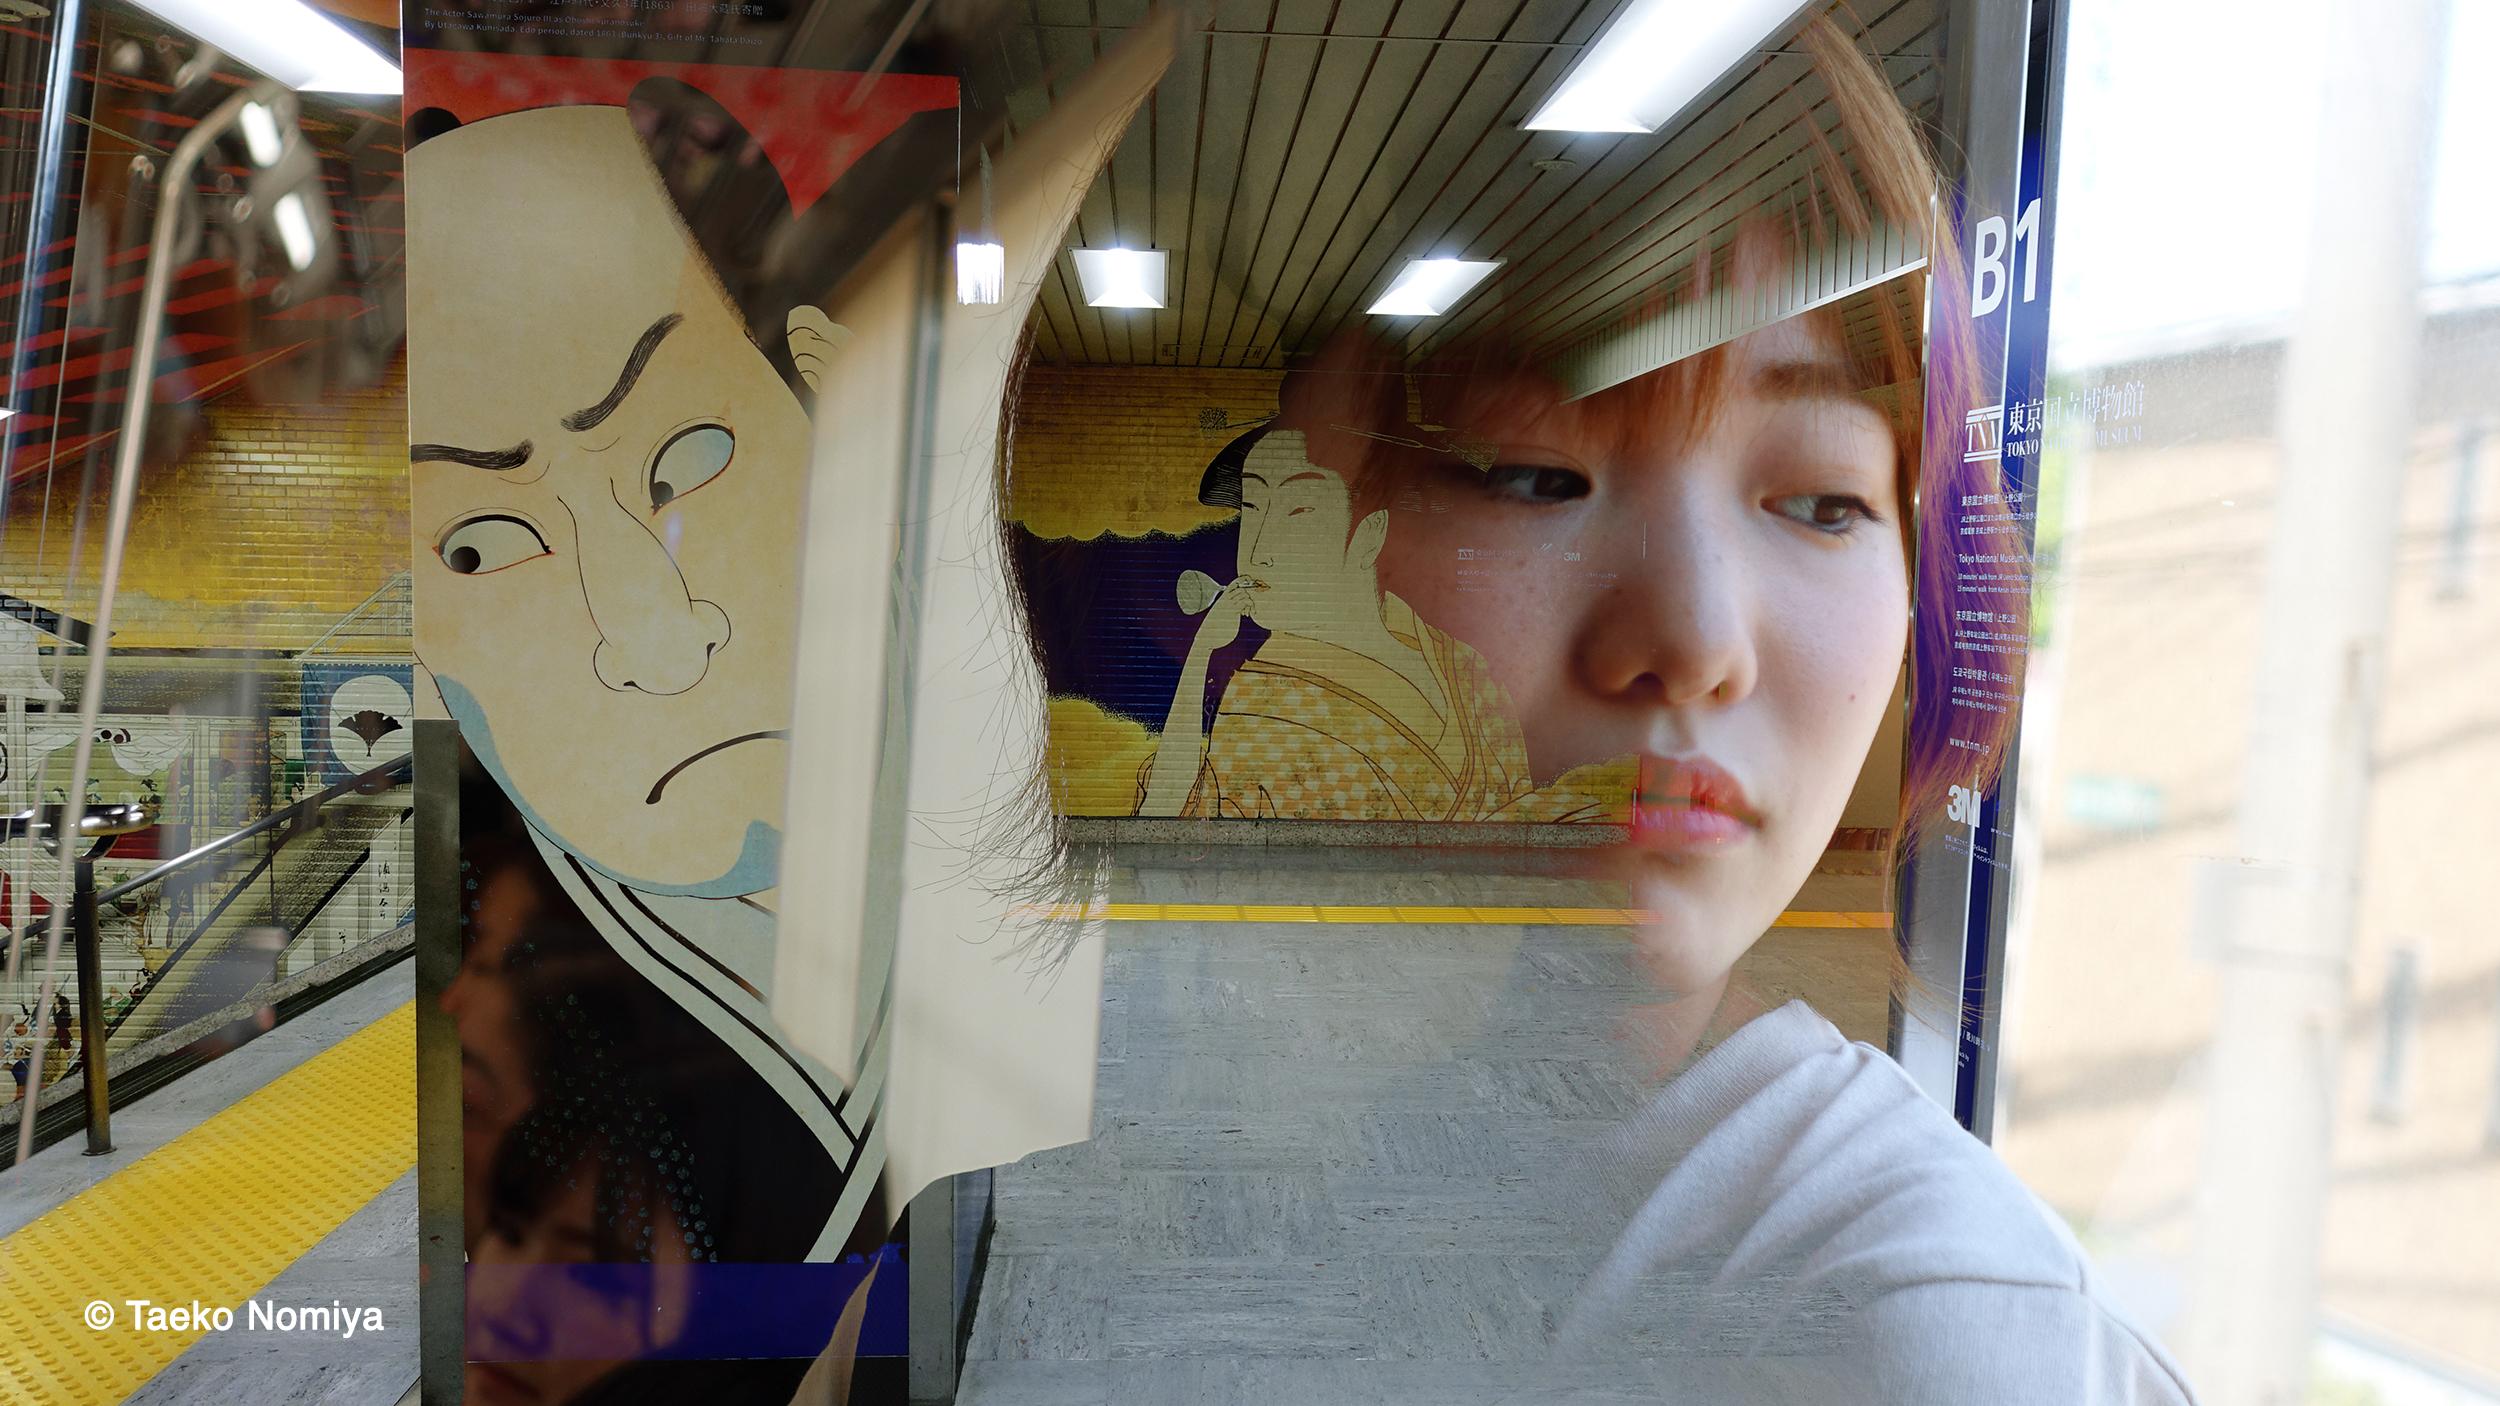 © Taeko Nomiya